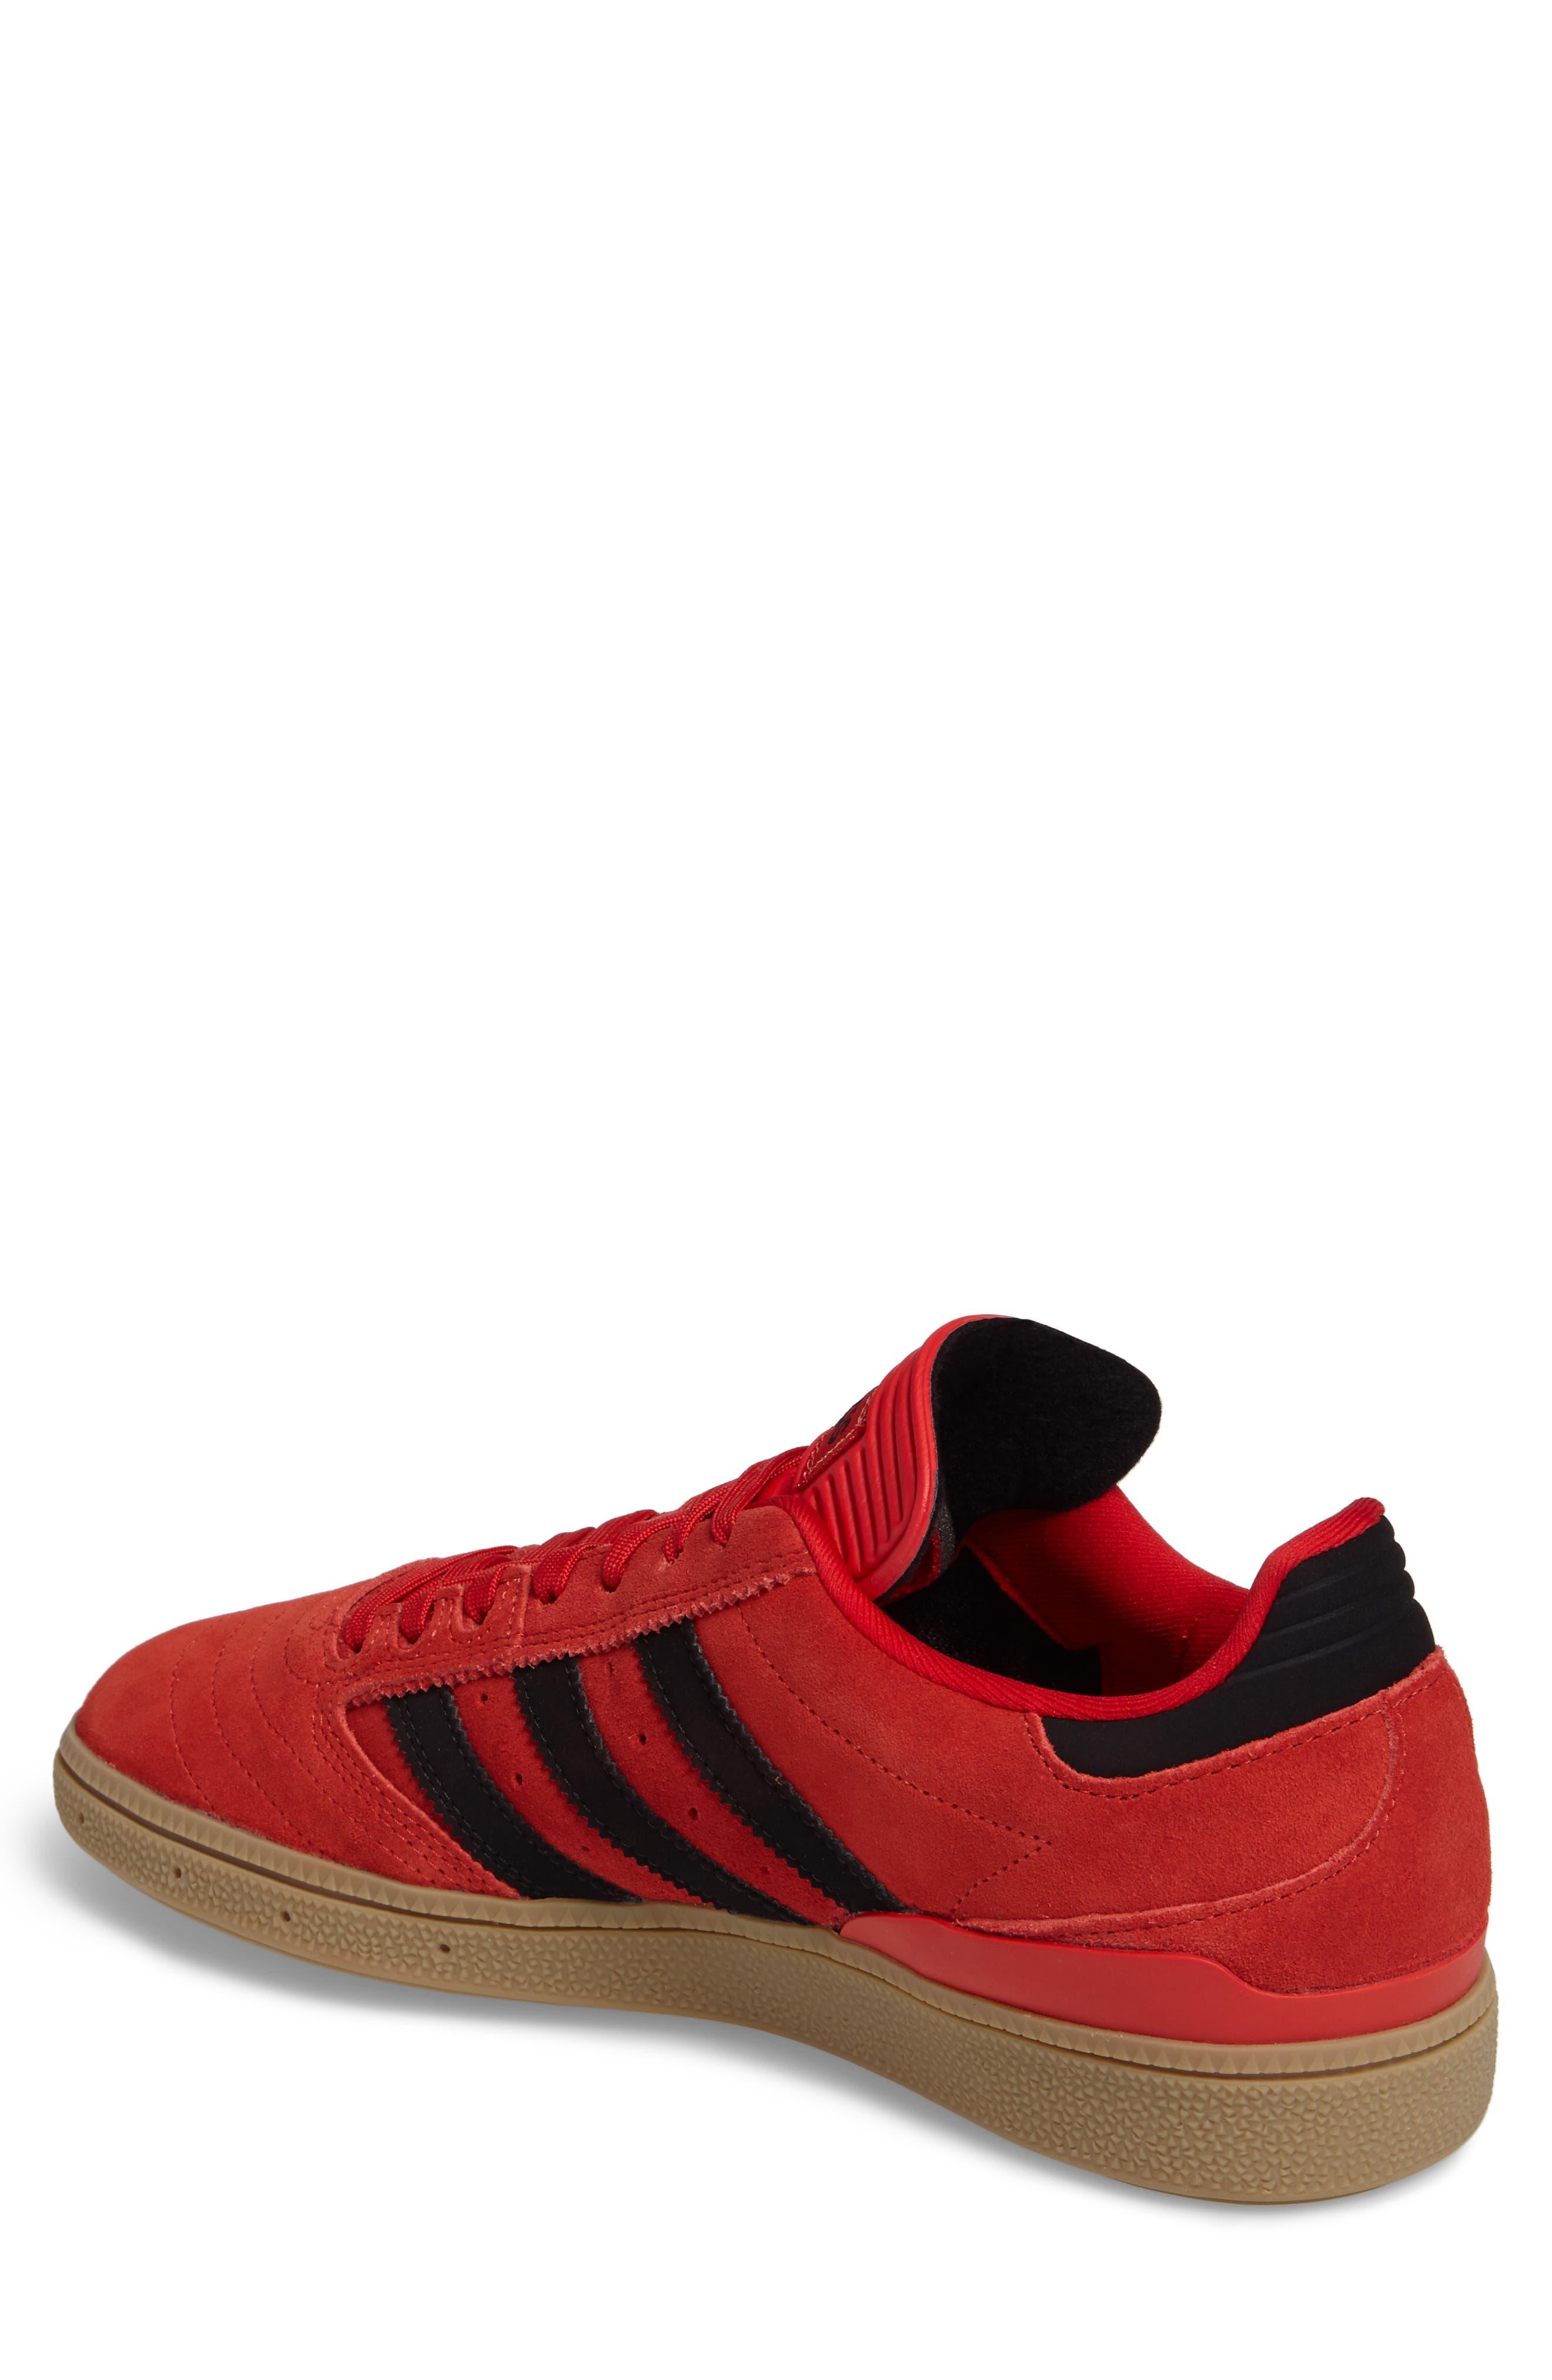 Busenitz Sneaker,                             Alternate thumbnail 2, color,                             Scarlet/ Core Black/ Gum4